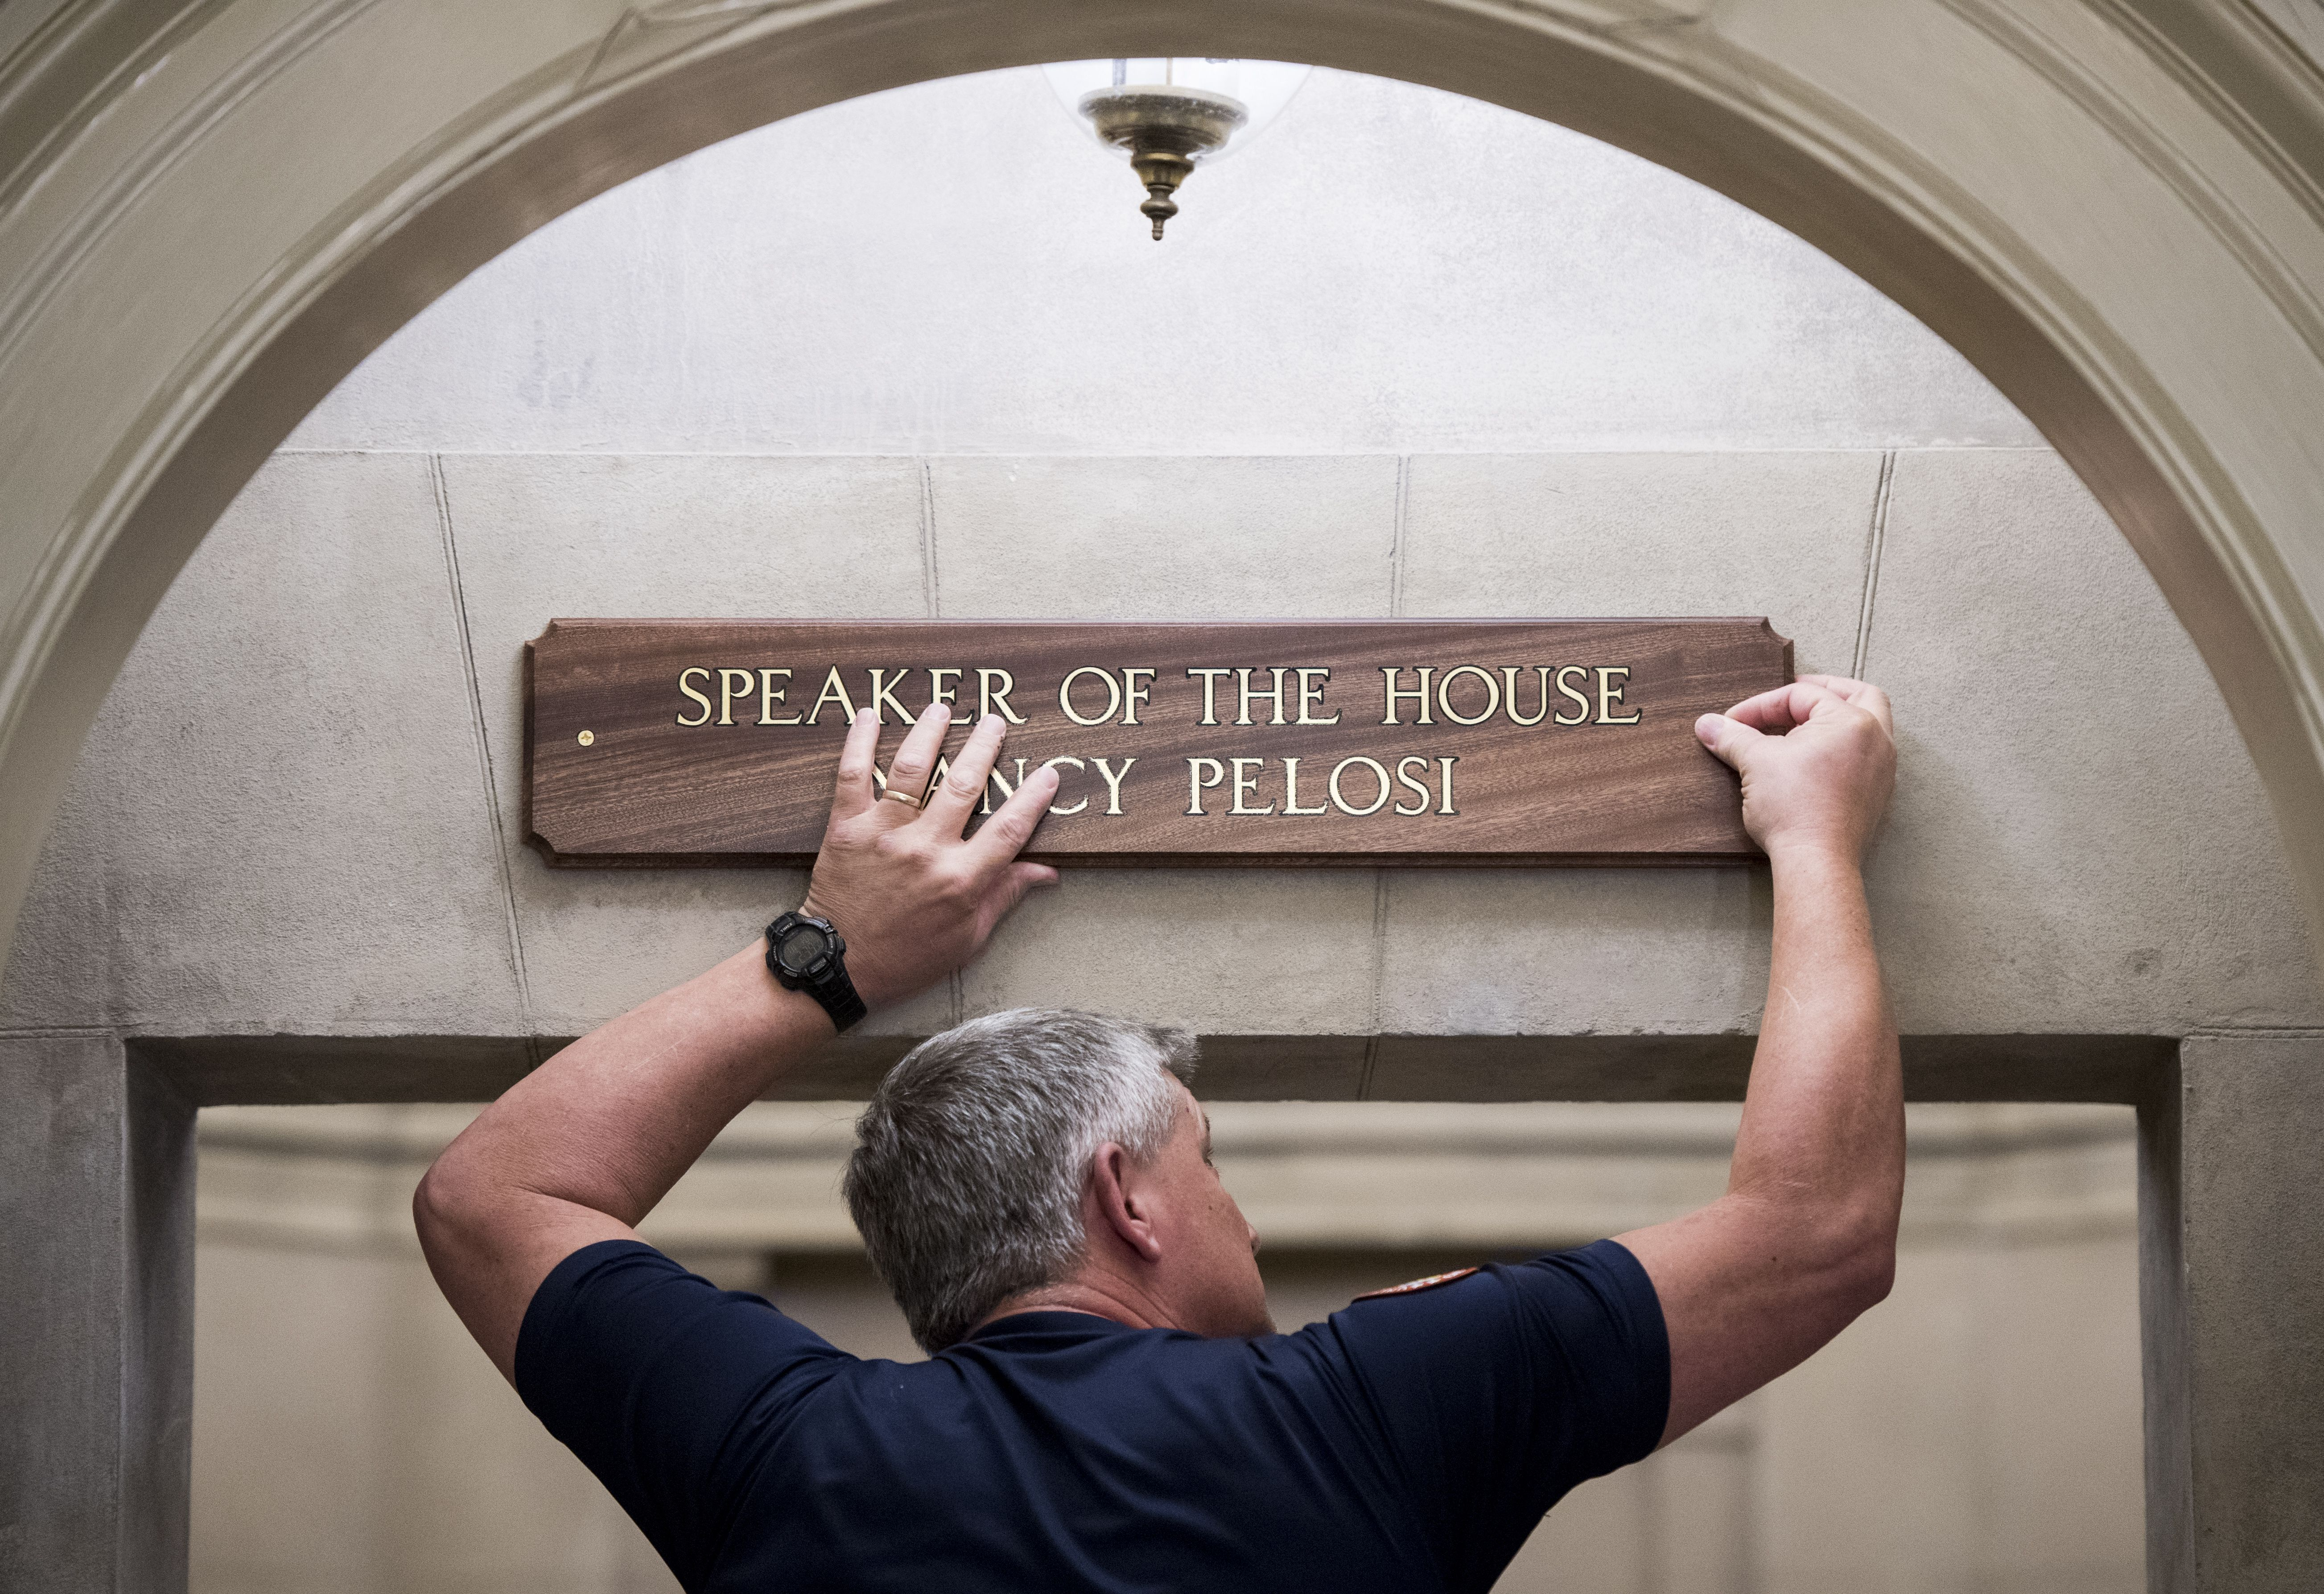 Employee hanging speaker of the house nancy pelosi sign above doorway